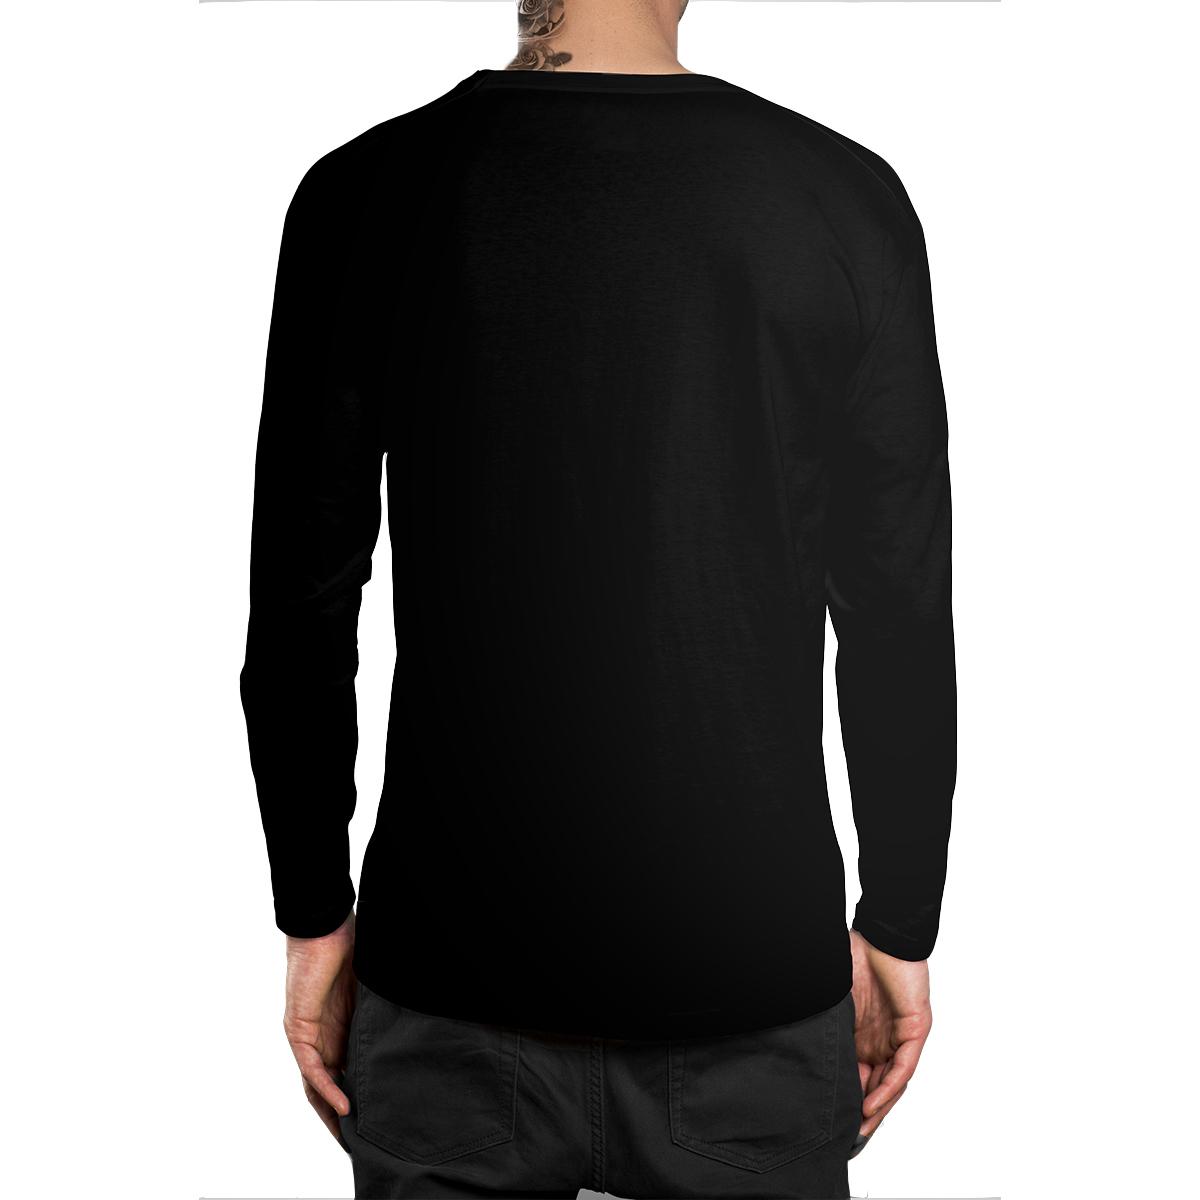 Stompy Camiseta Manga Longa Modelo 08